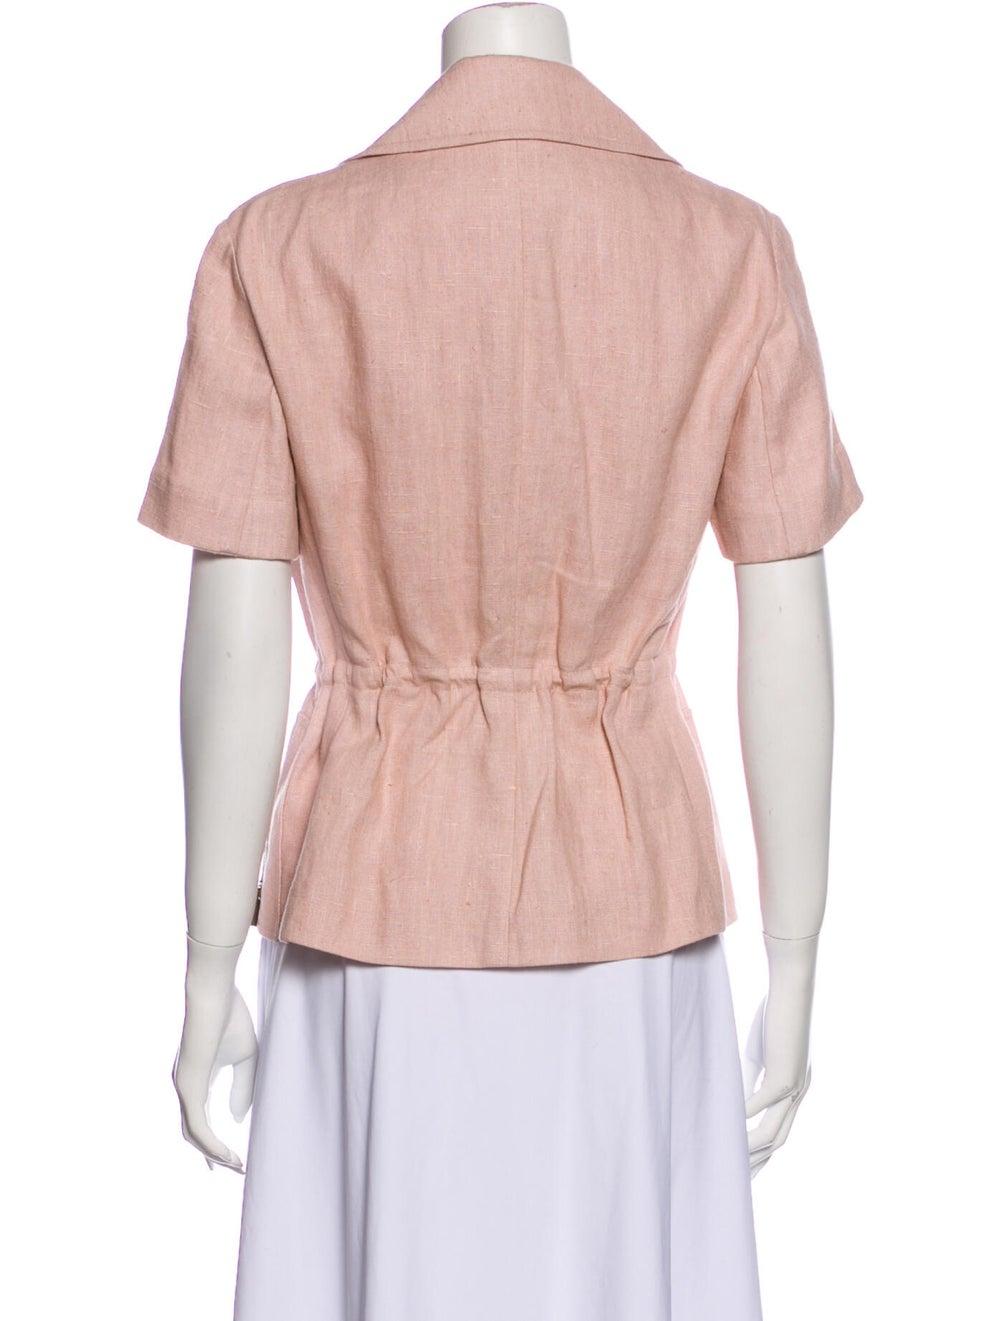 Akris Punto Linen Jacket - image 3